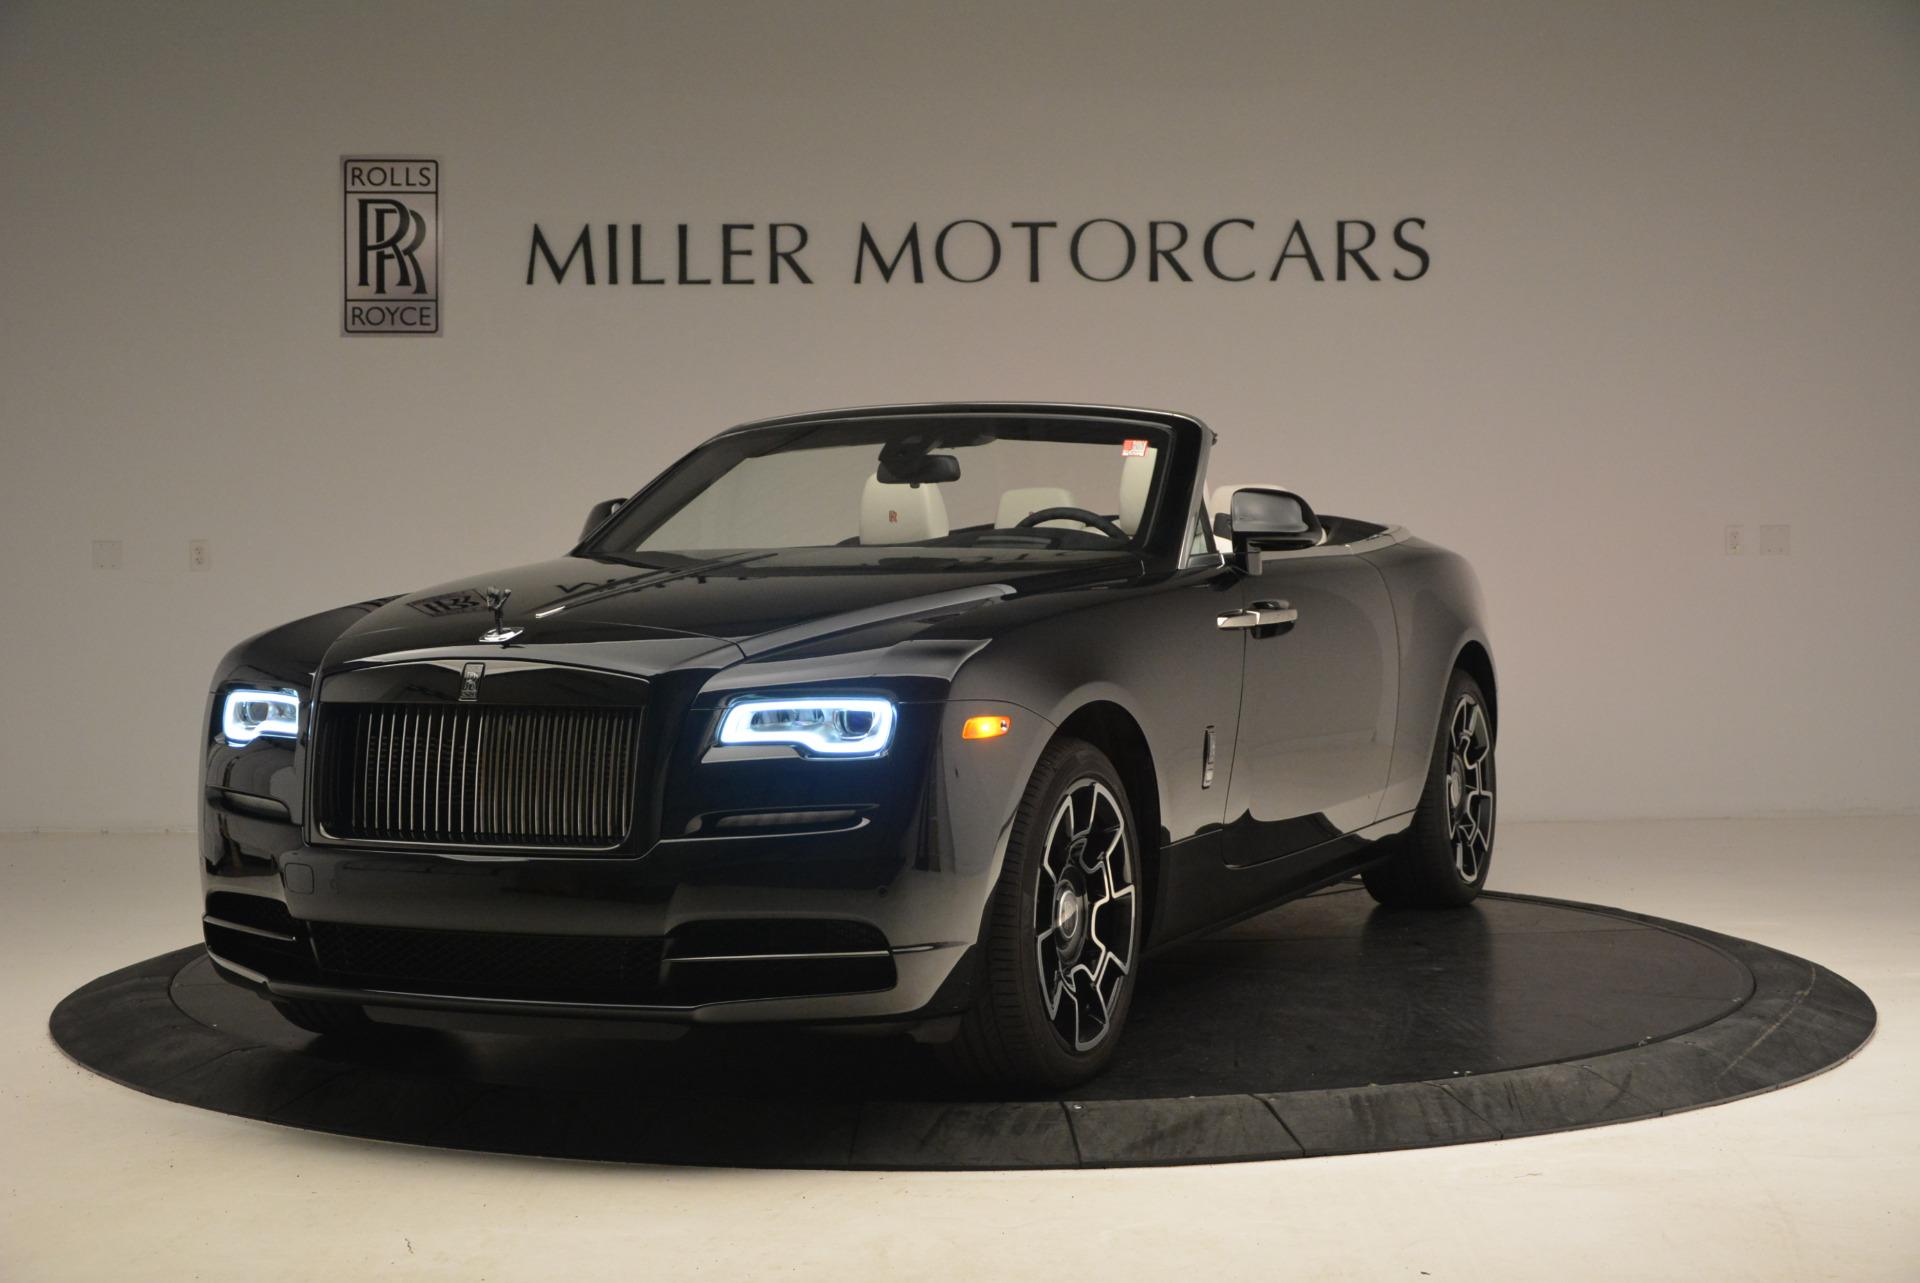 New 2018 Rolls-Royce Dawn Black Badge for sale Sold at Alfa Romeo of Westport in Westport CT 06880 1